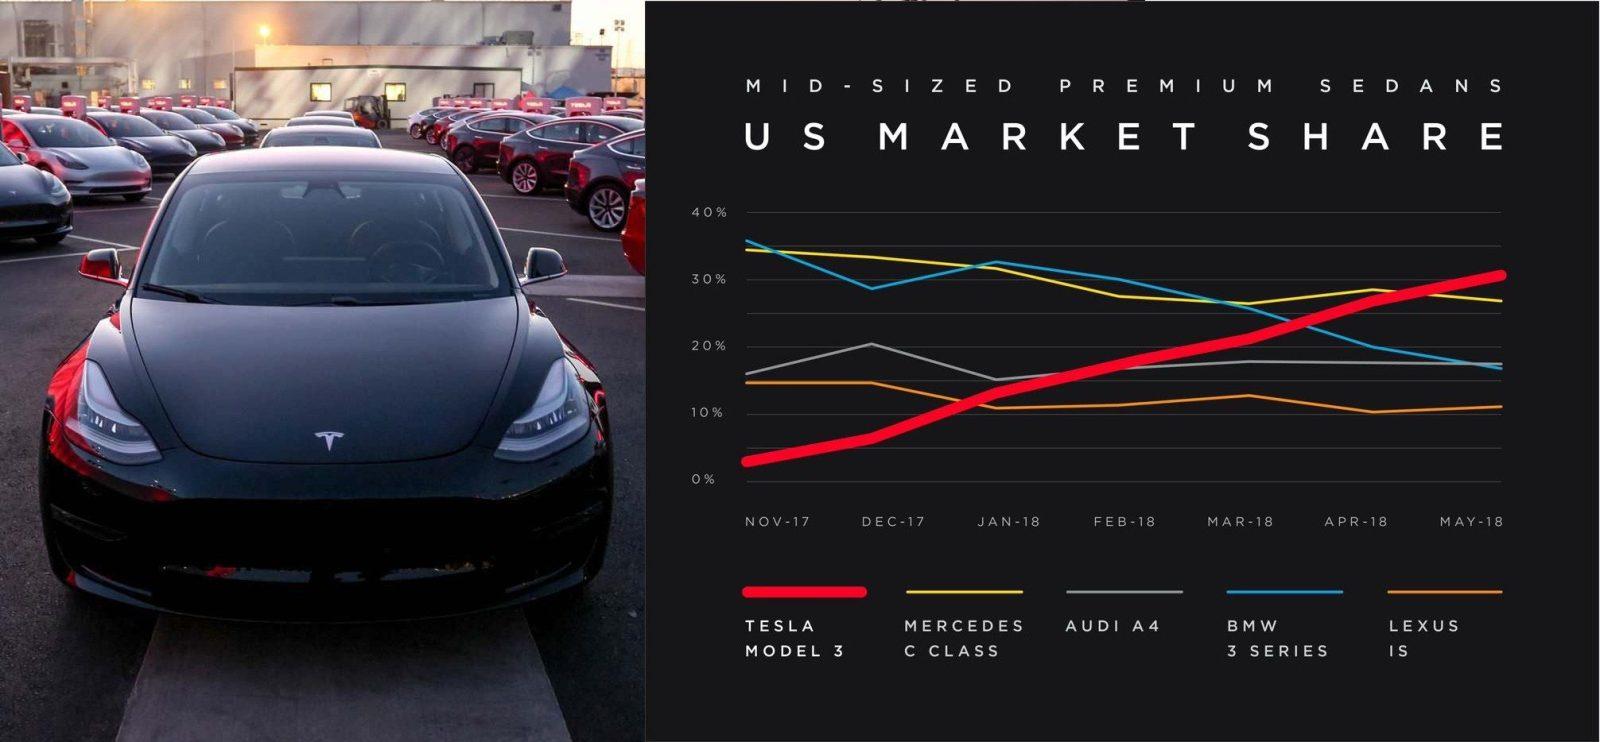 https://electrek.co/wp-content/uploads/sites/3/2019/07/tesla-model-3-market-share-hero.jpg?quality=82&strip=all&w=1600